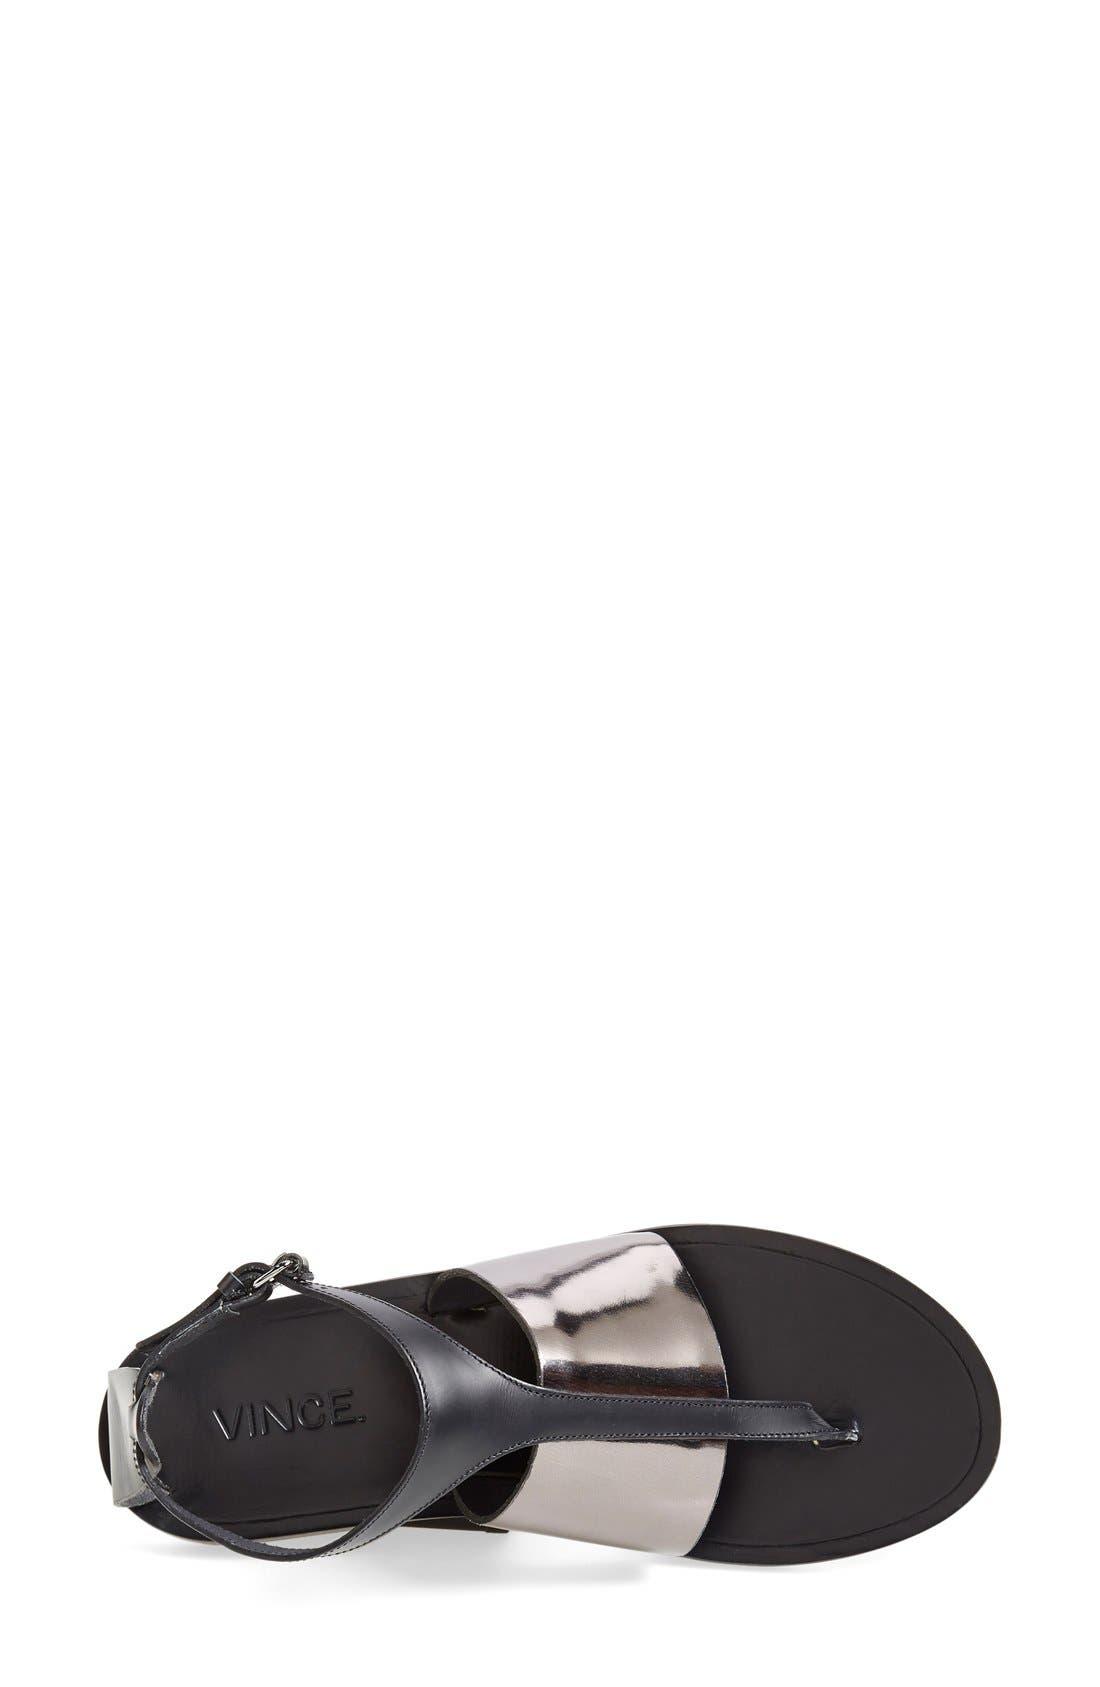 Alternate Image 2  - Vince 'Thea' Ankle Strap Thong Sandal (Women)